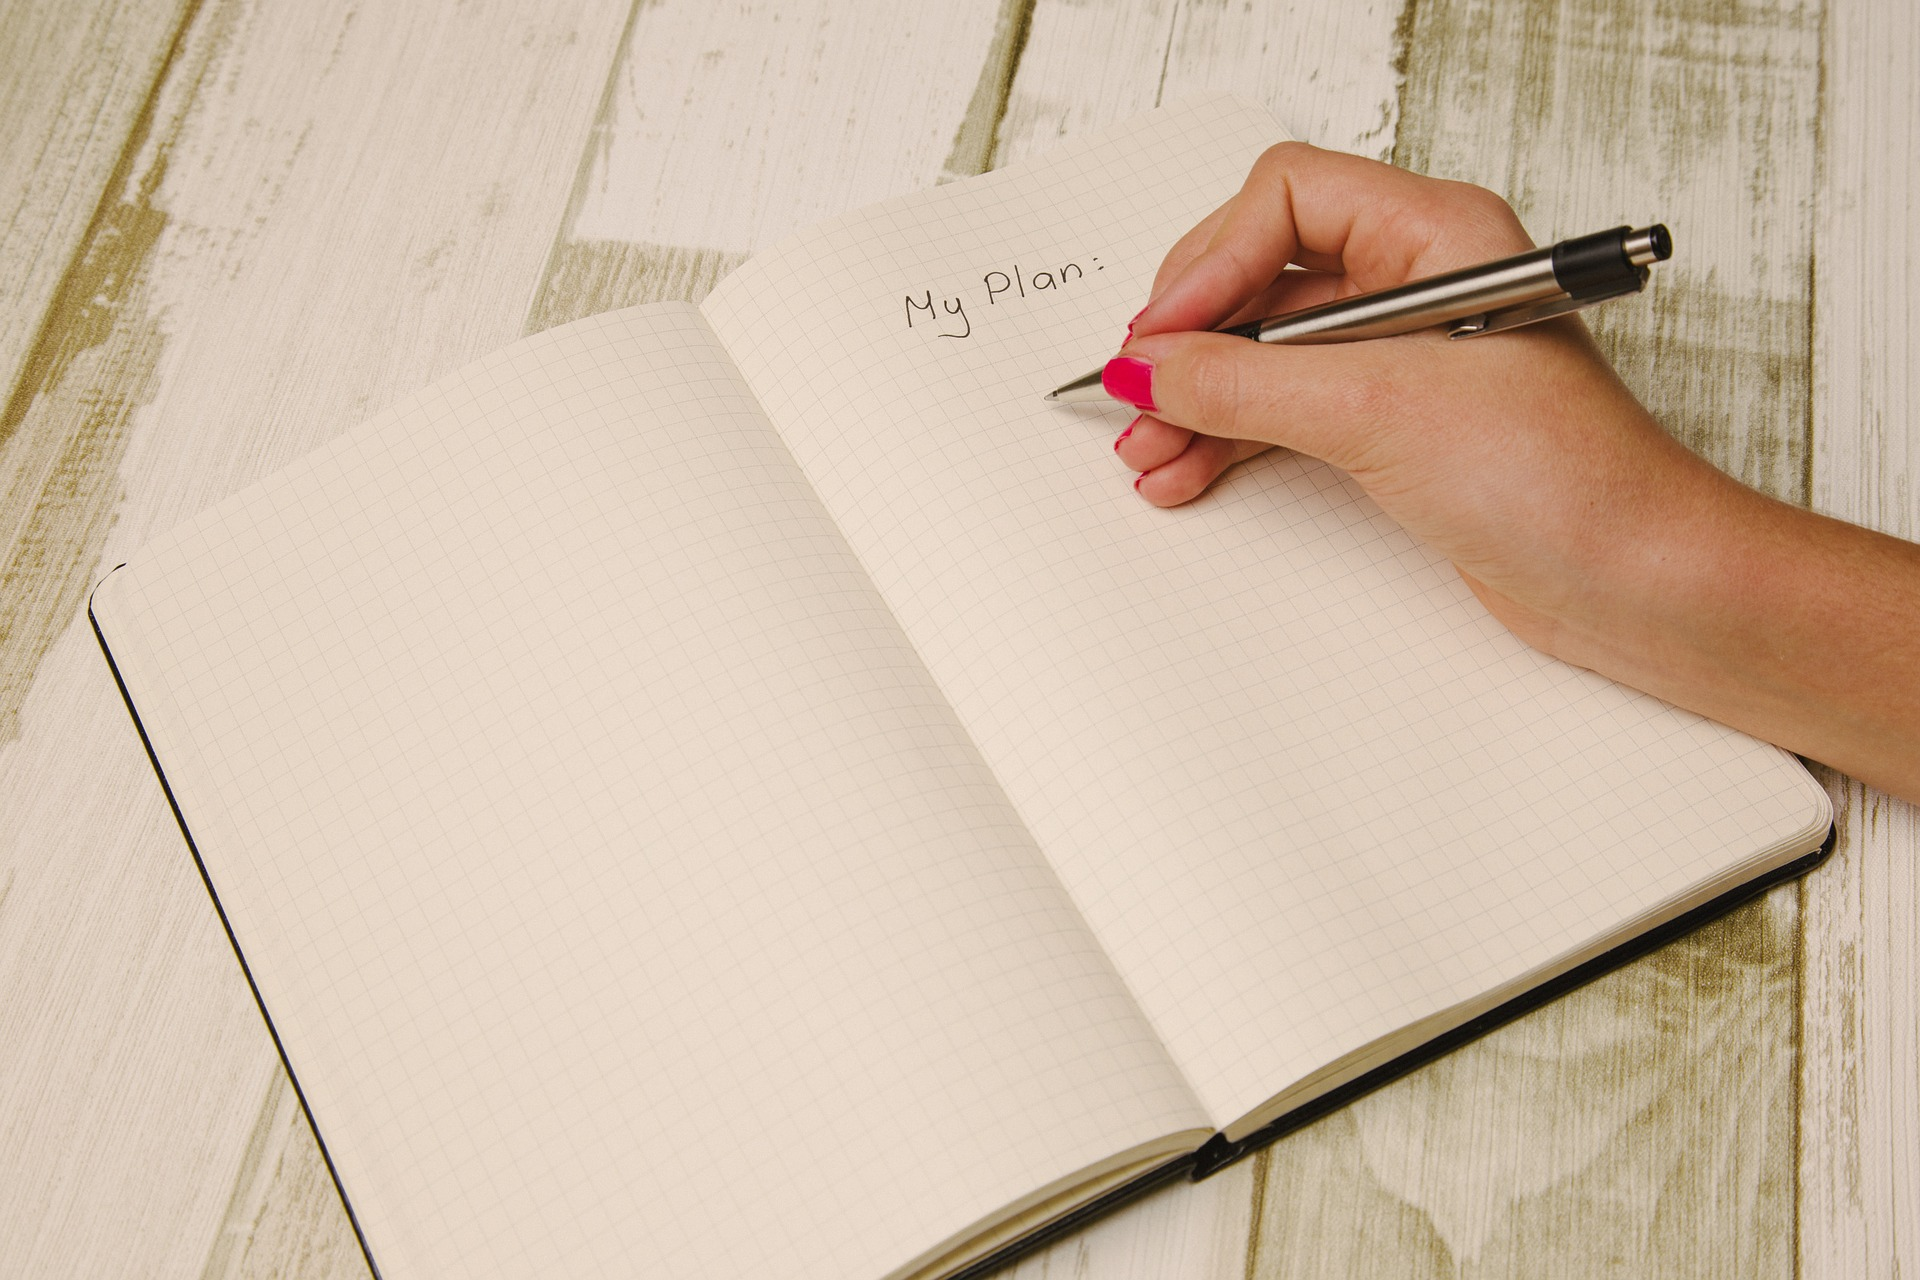 Daly Gem: The Magic of Simplicity